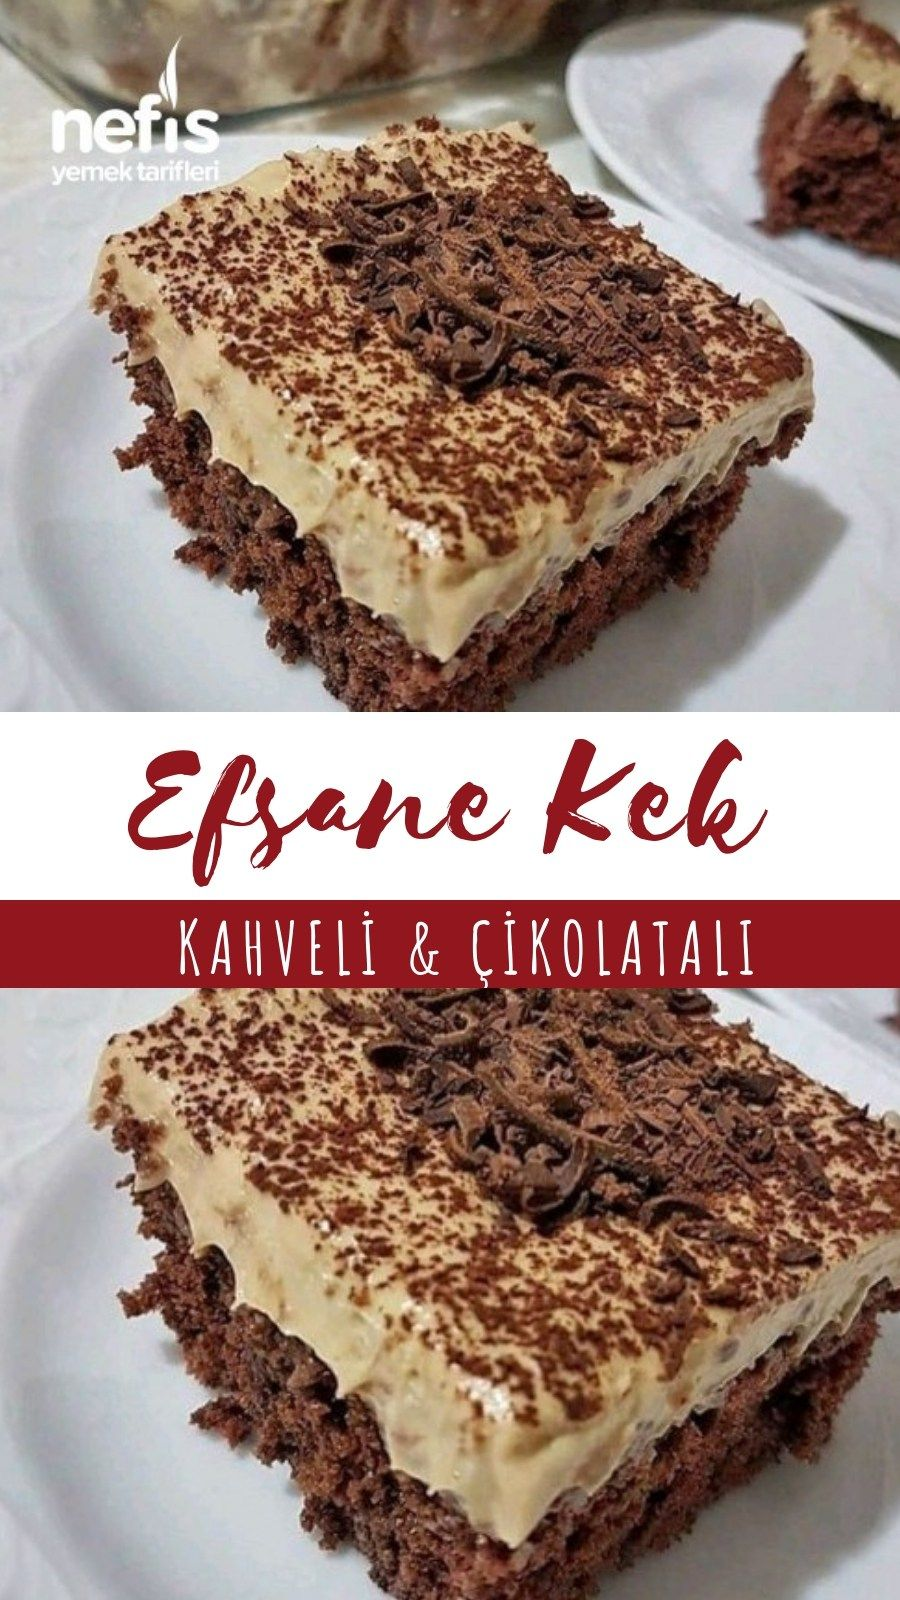 Kahveli Çikolatalı Kek – Nefis Yemek Tarifleri – #5661780